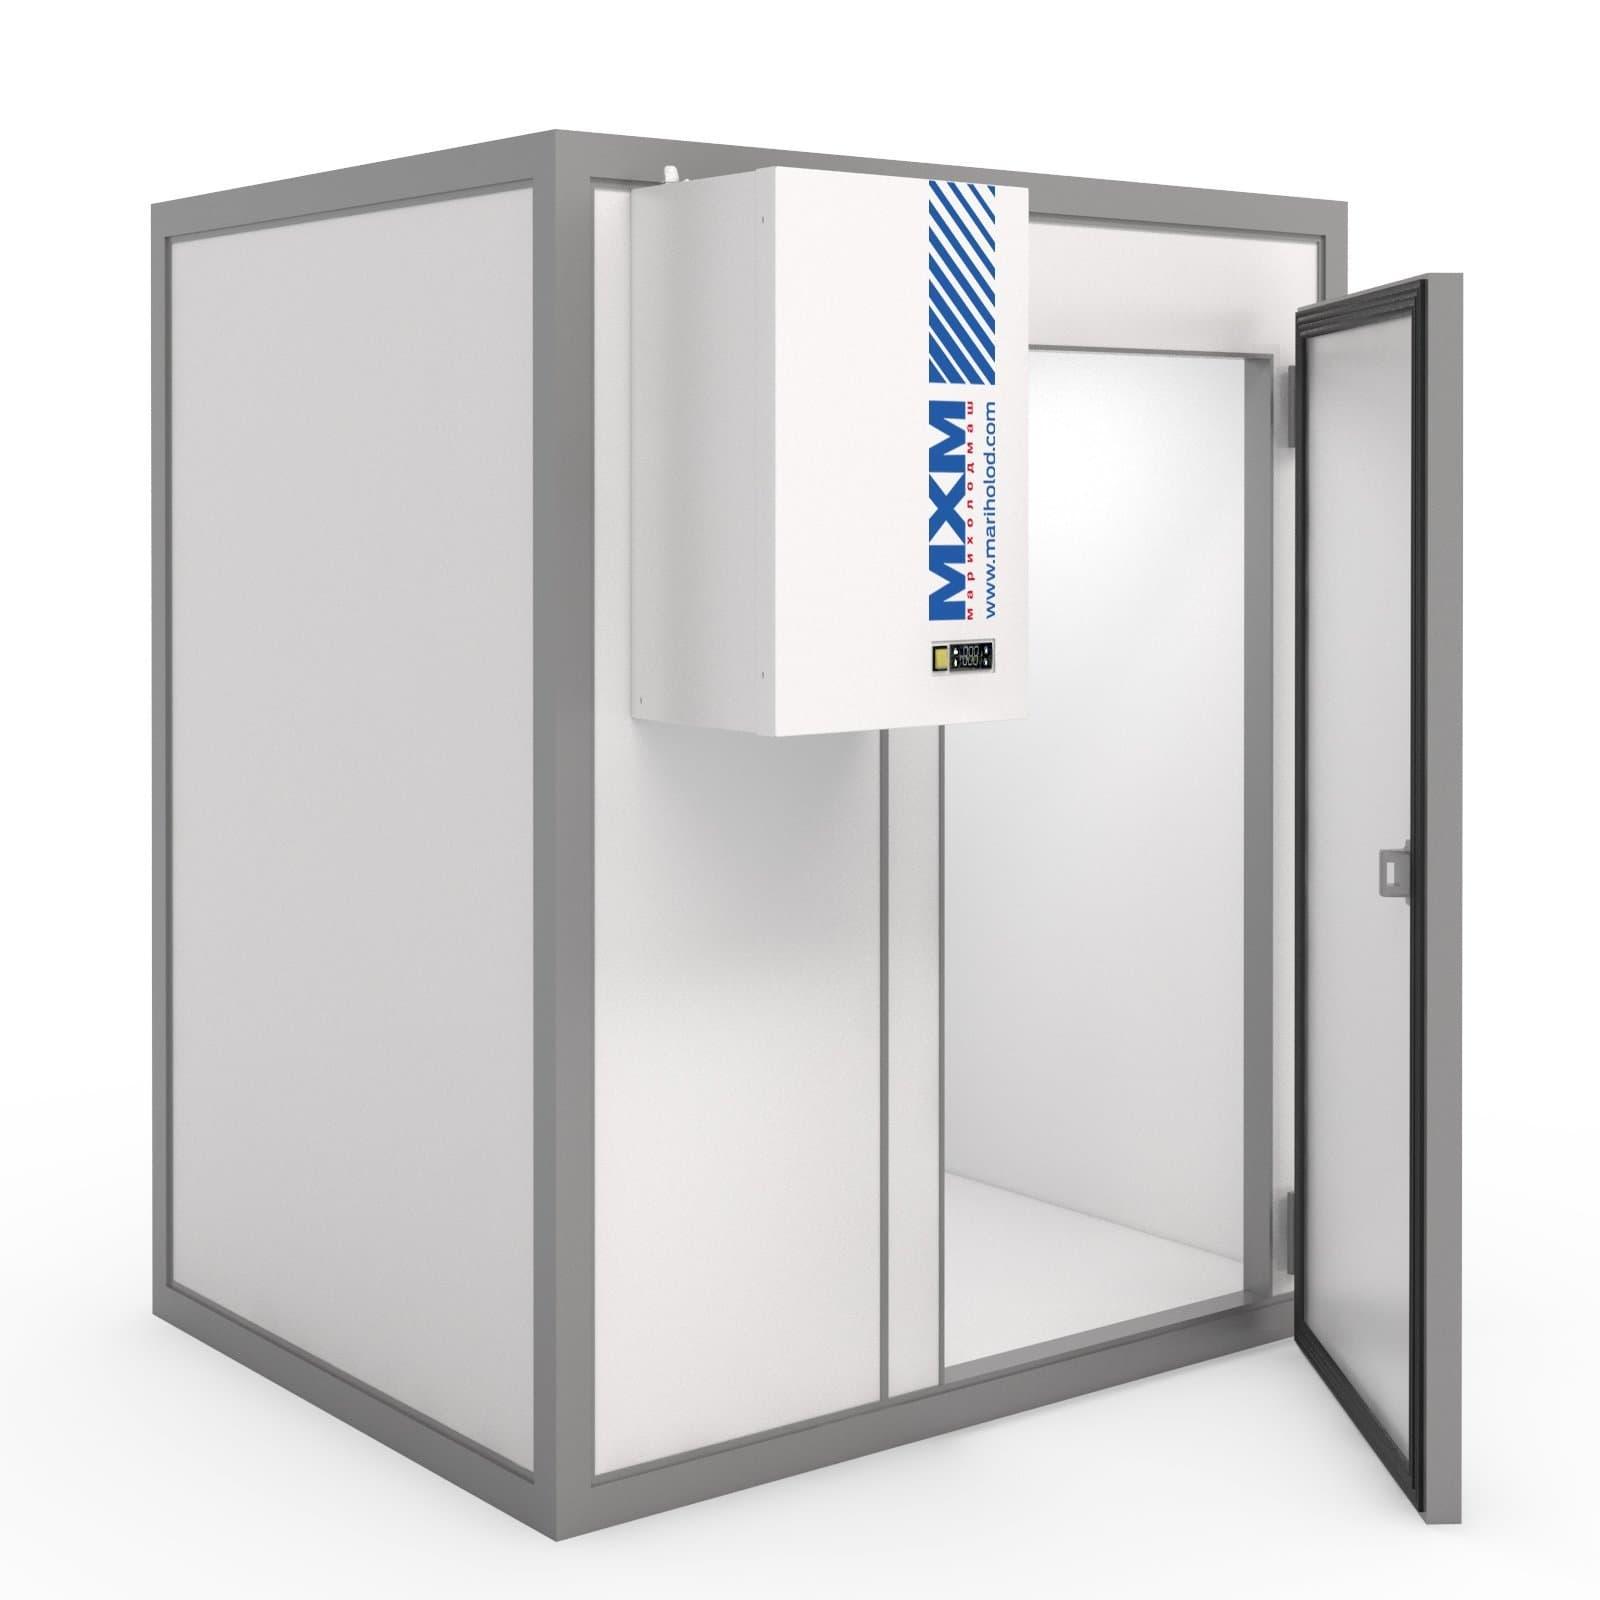 Камера холодильная МХМ КХН- 6,61 1360×2860×2200